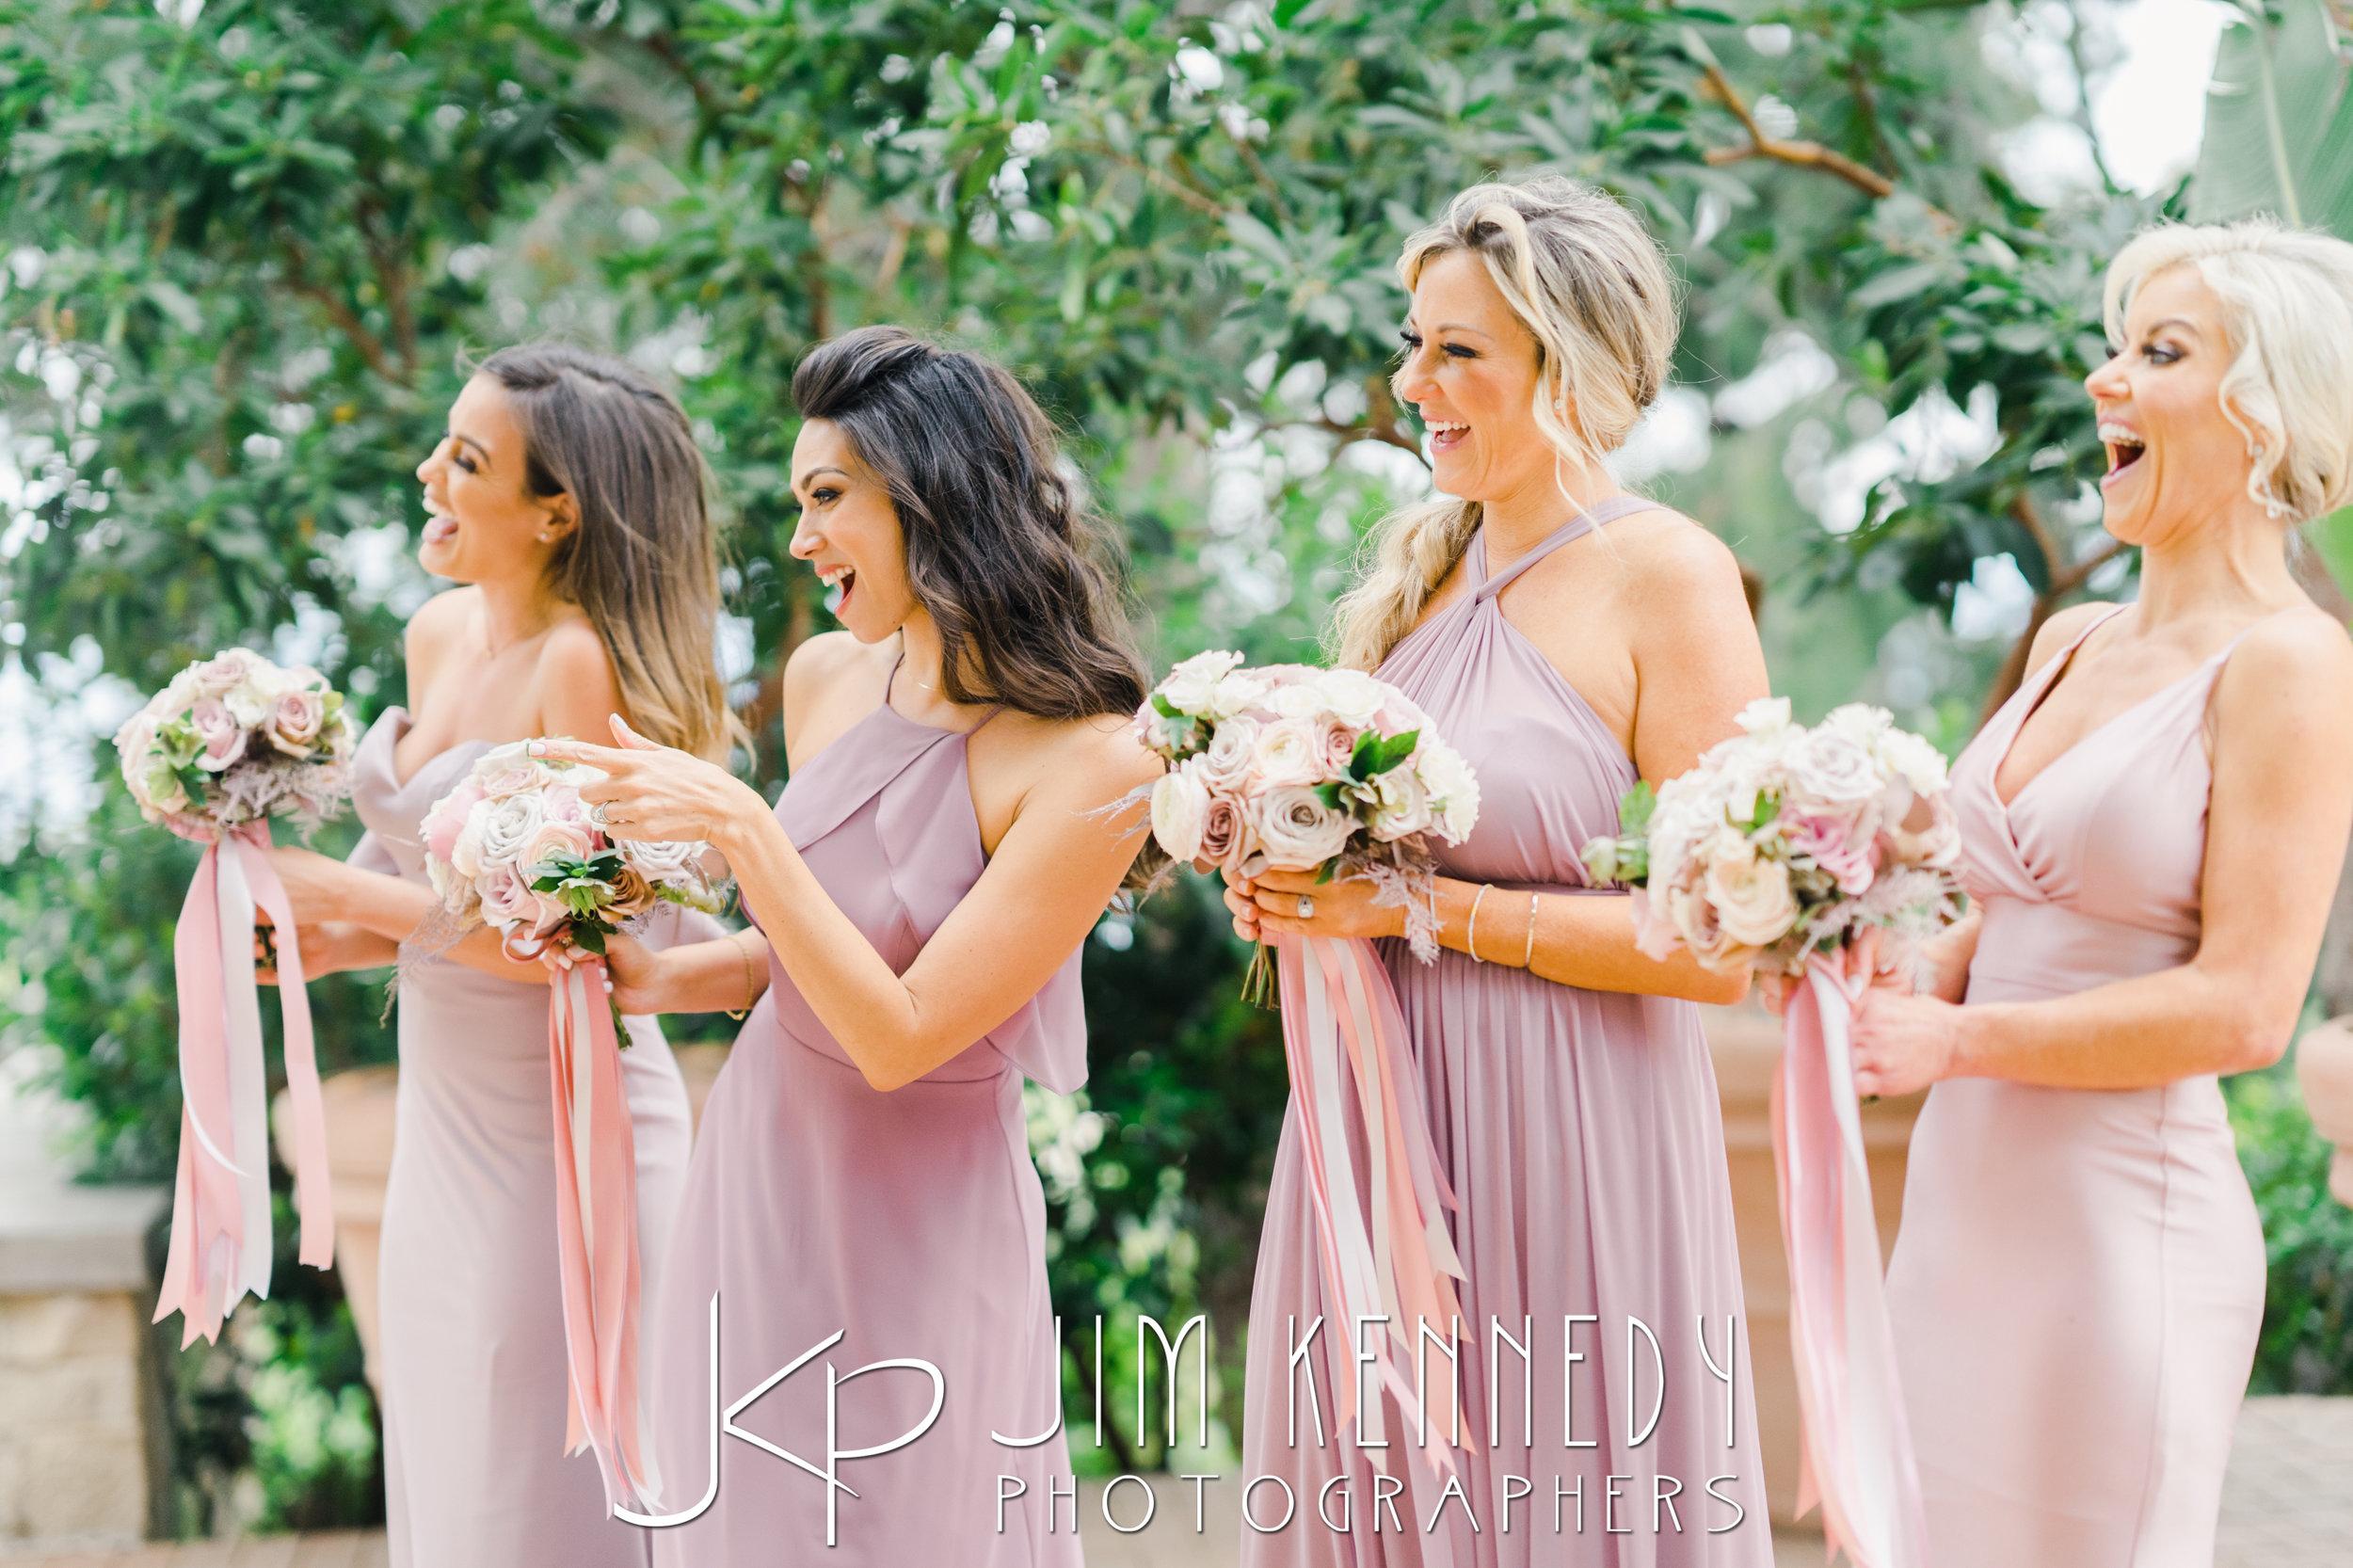 pelican-hill-wedding-jim-kenedy-photographers_0058.JPG